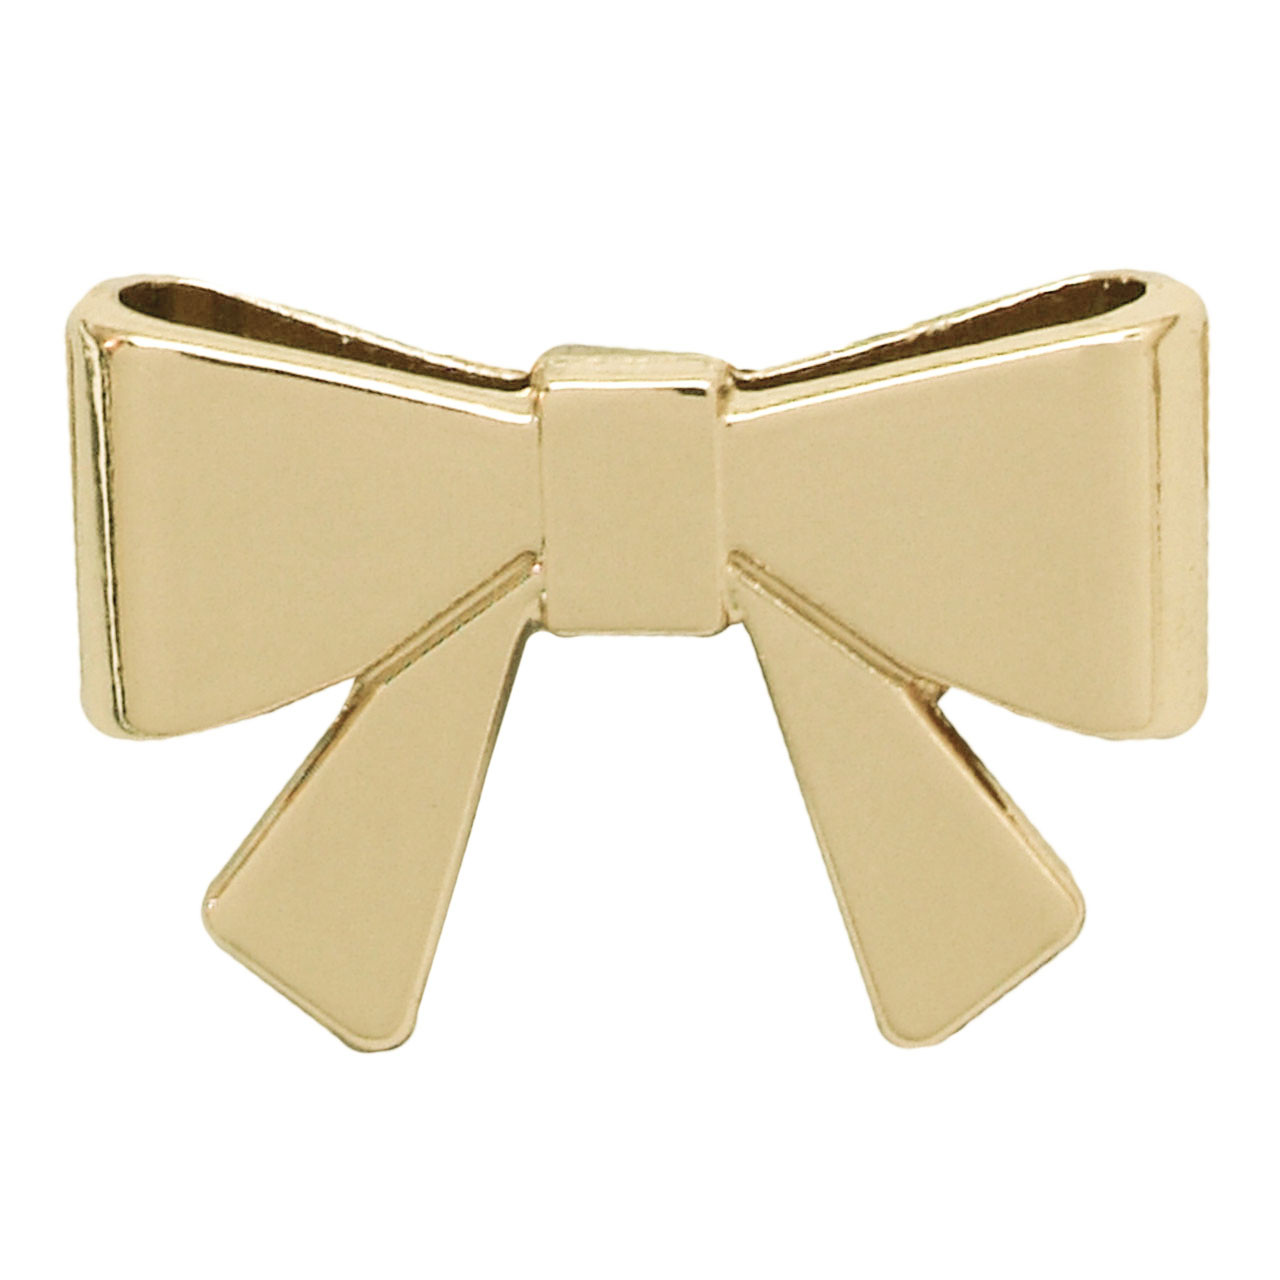 Пряжка галстук-бабочка 2,5х1,6 см золото